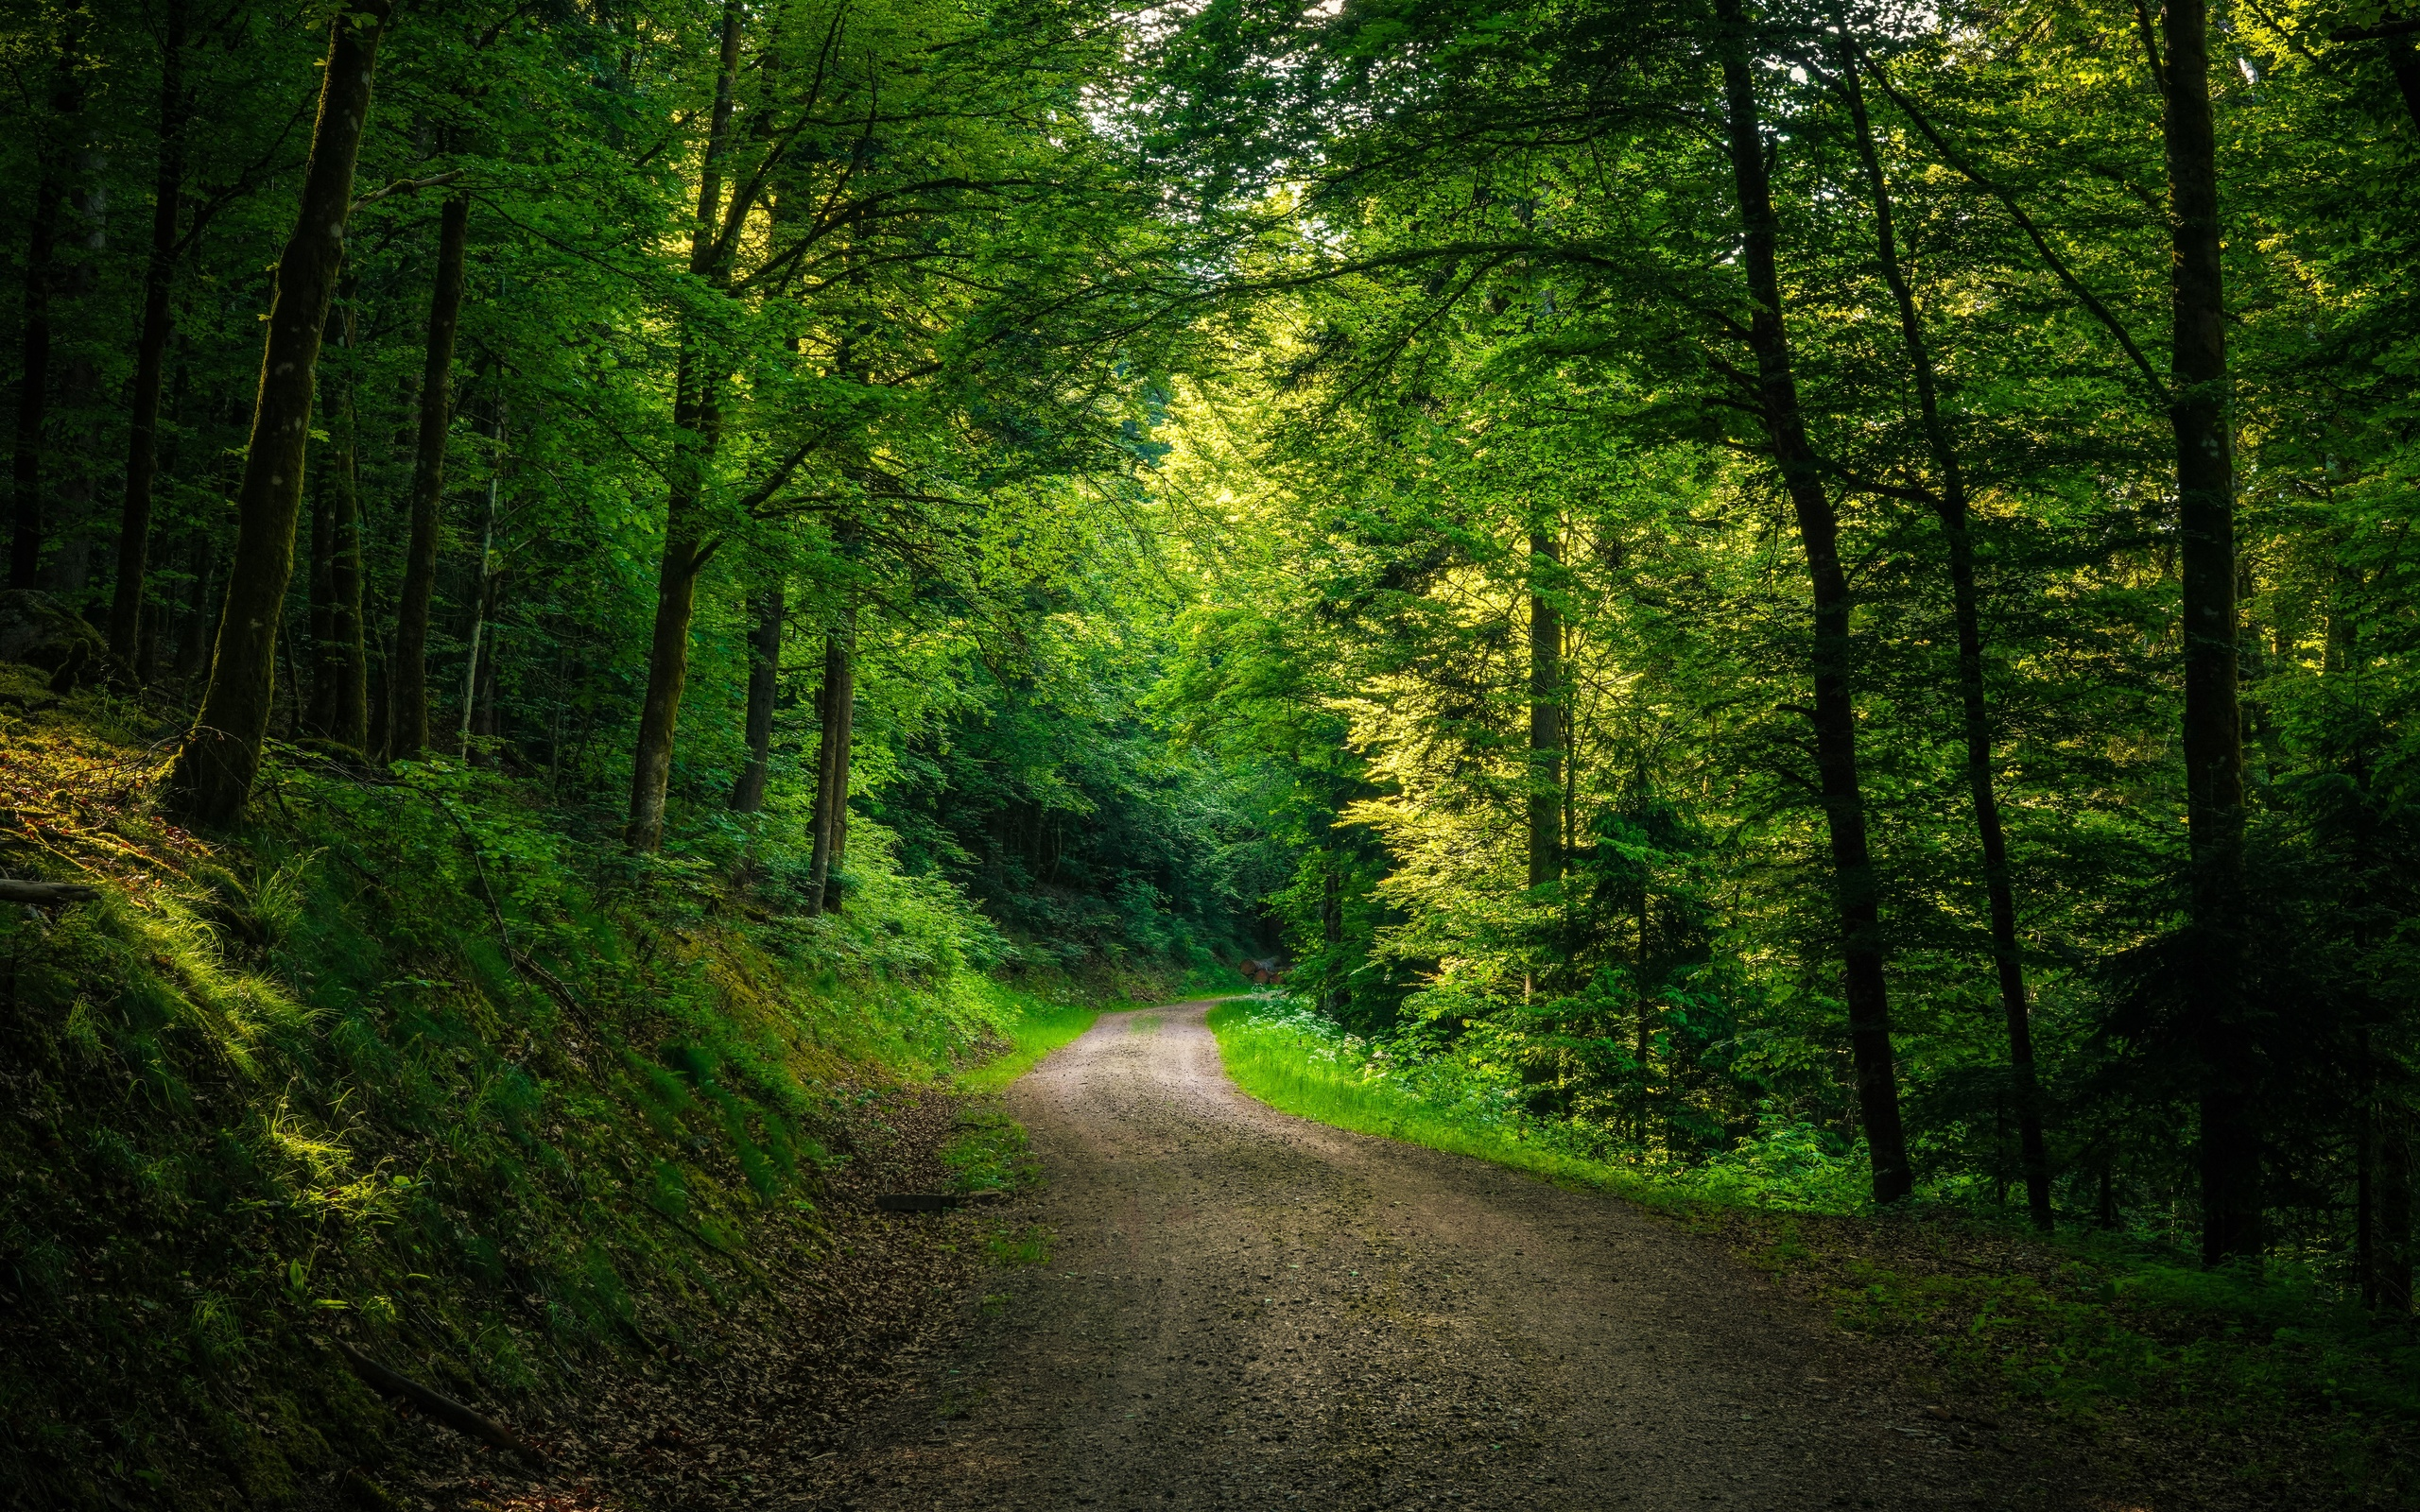 дорога, лес, деревья, природа, пейзаж